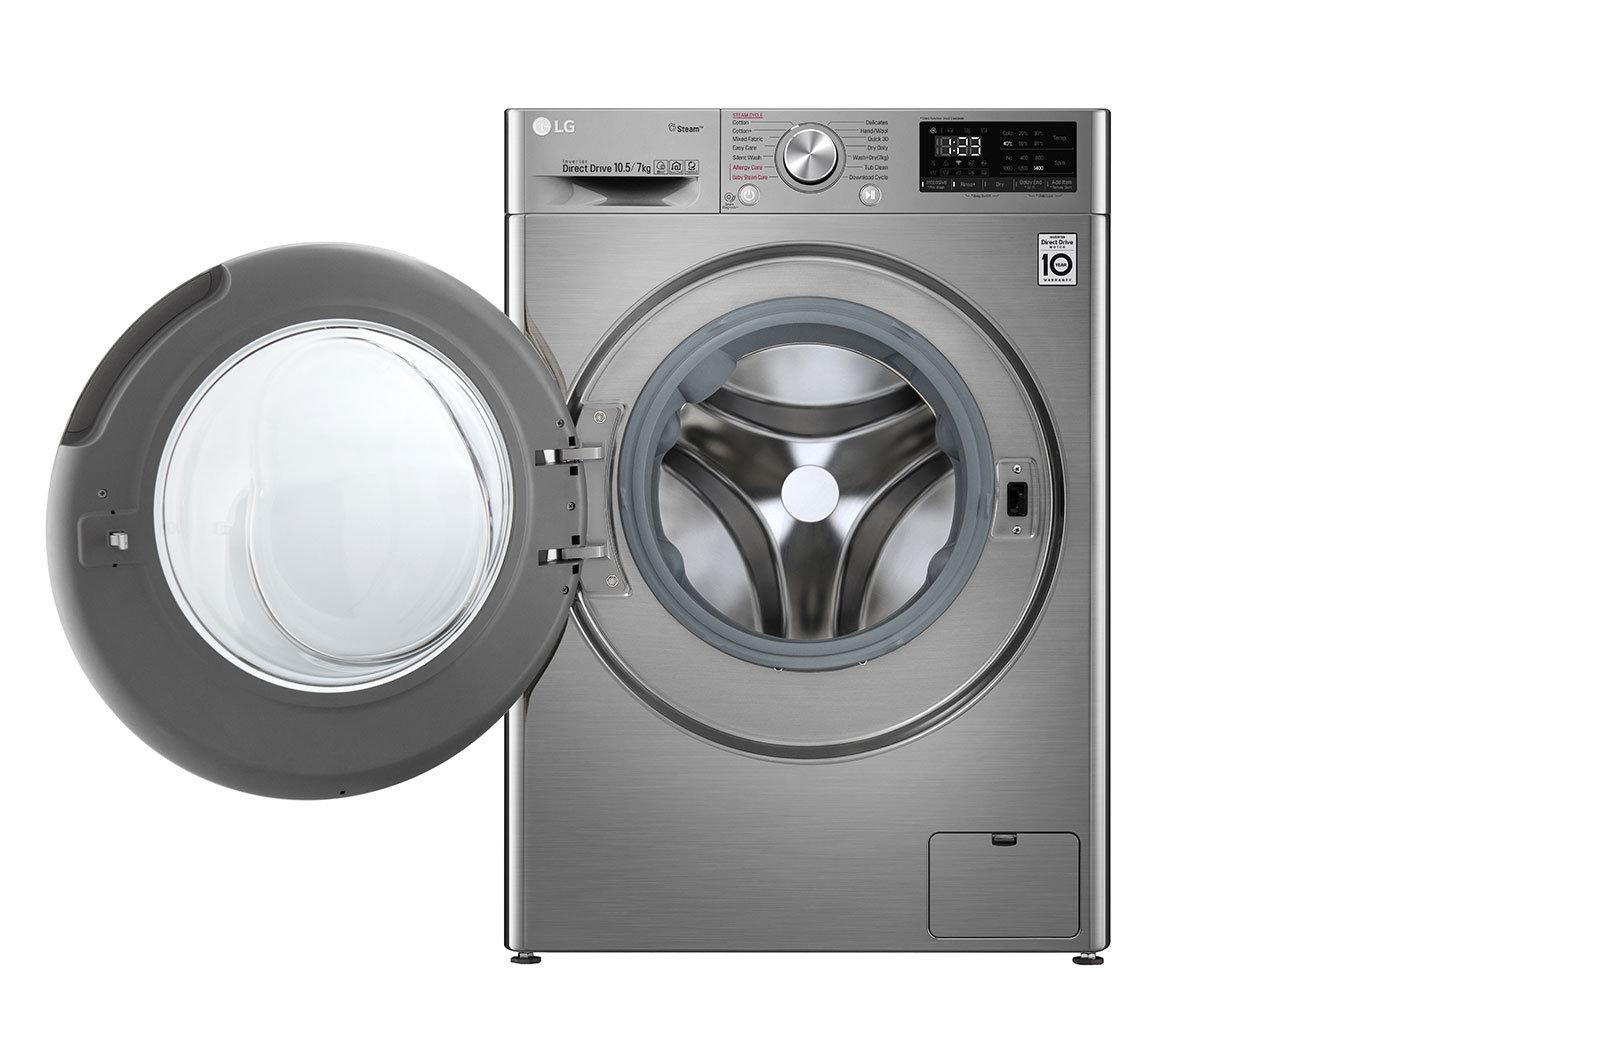 LG Front Load Washing Machine 7Kg/10.5Kg FHD1057STB | Cool World